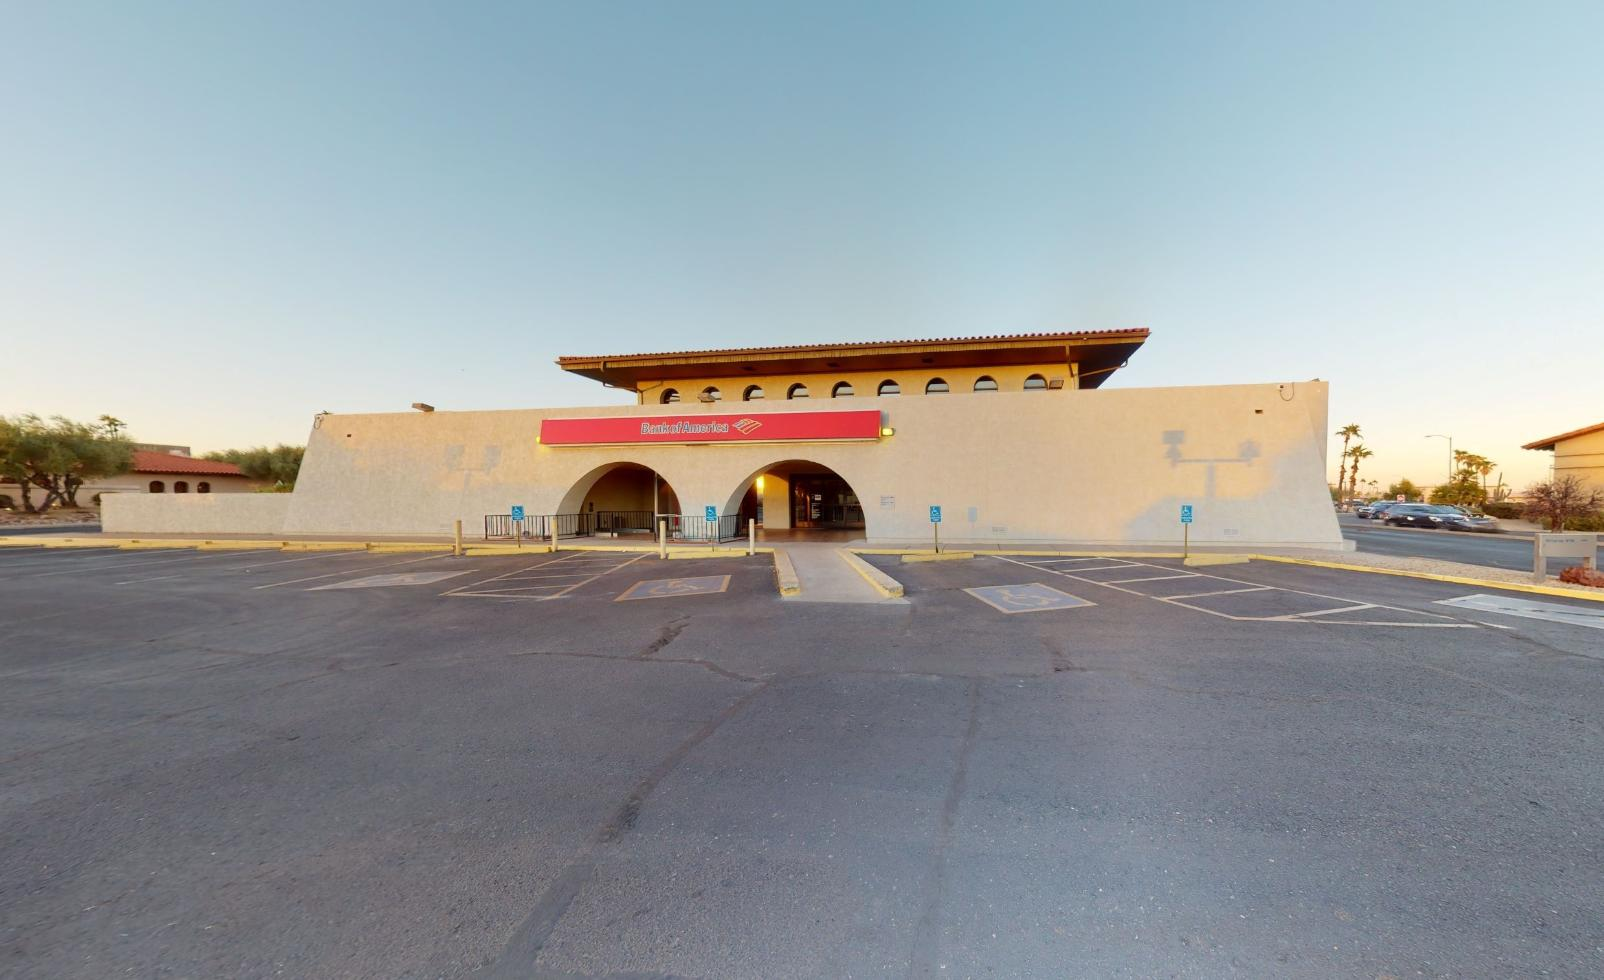 Bank of America financial center with drive-thru ATM | 19022 N R H Johnson Blvd, Sun City West, AZ 85375